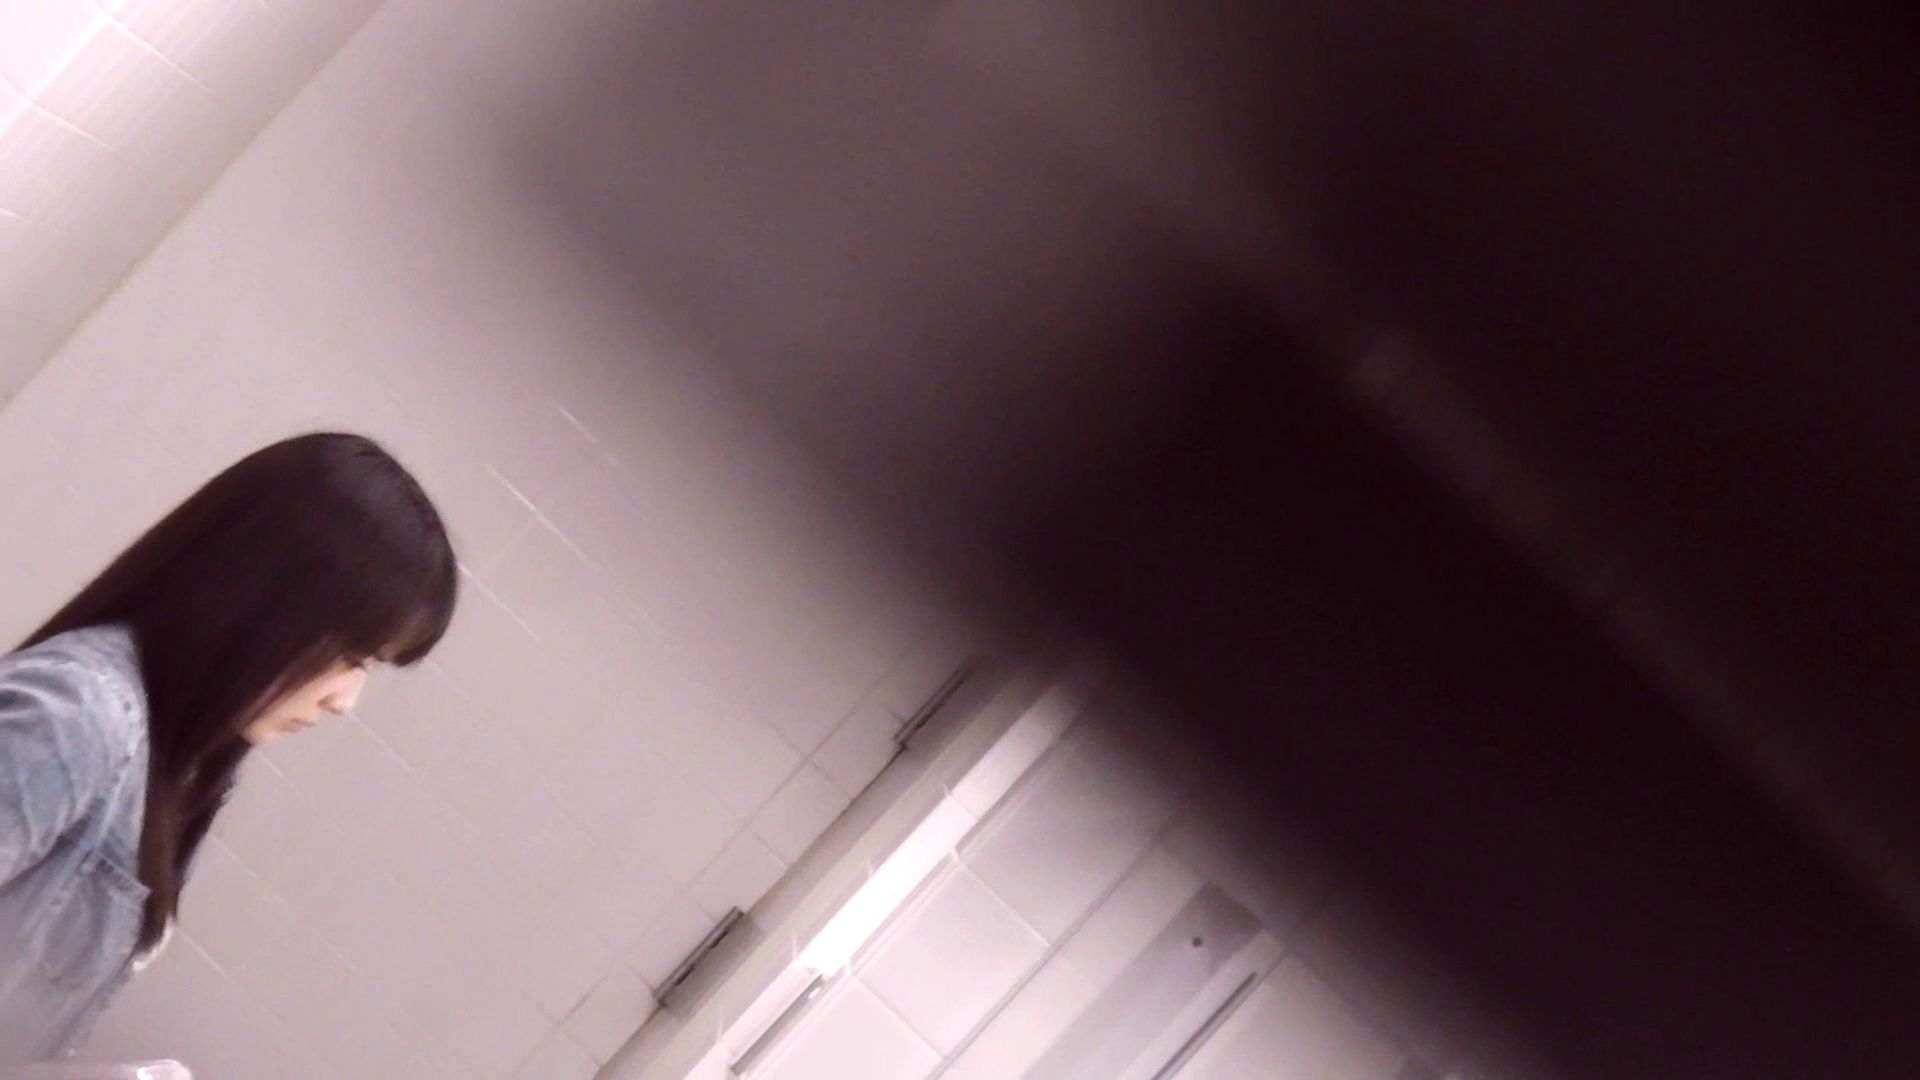 vol.13 命がけ潜伏洗面所! 大丈夫ですか?はまりそうです。 洗面所突入 おまんこ無修正動画無料 100pic 18